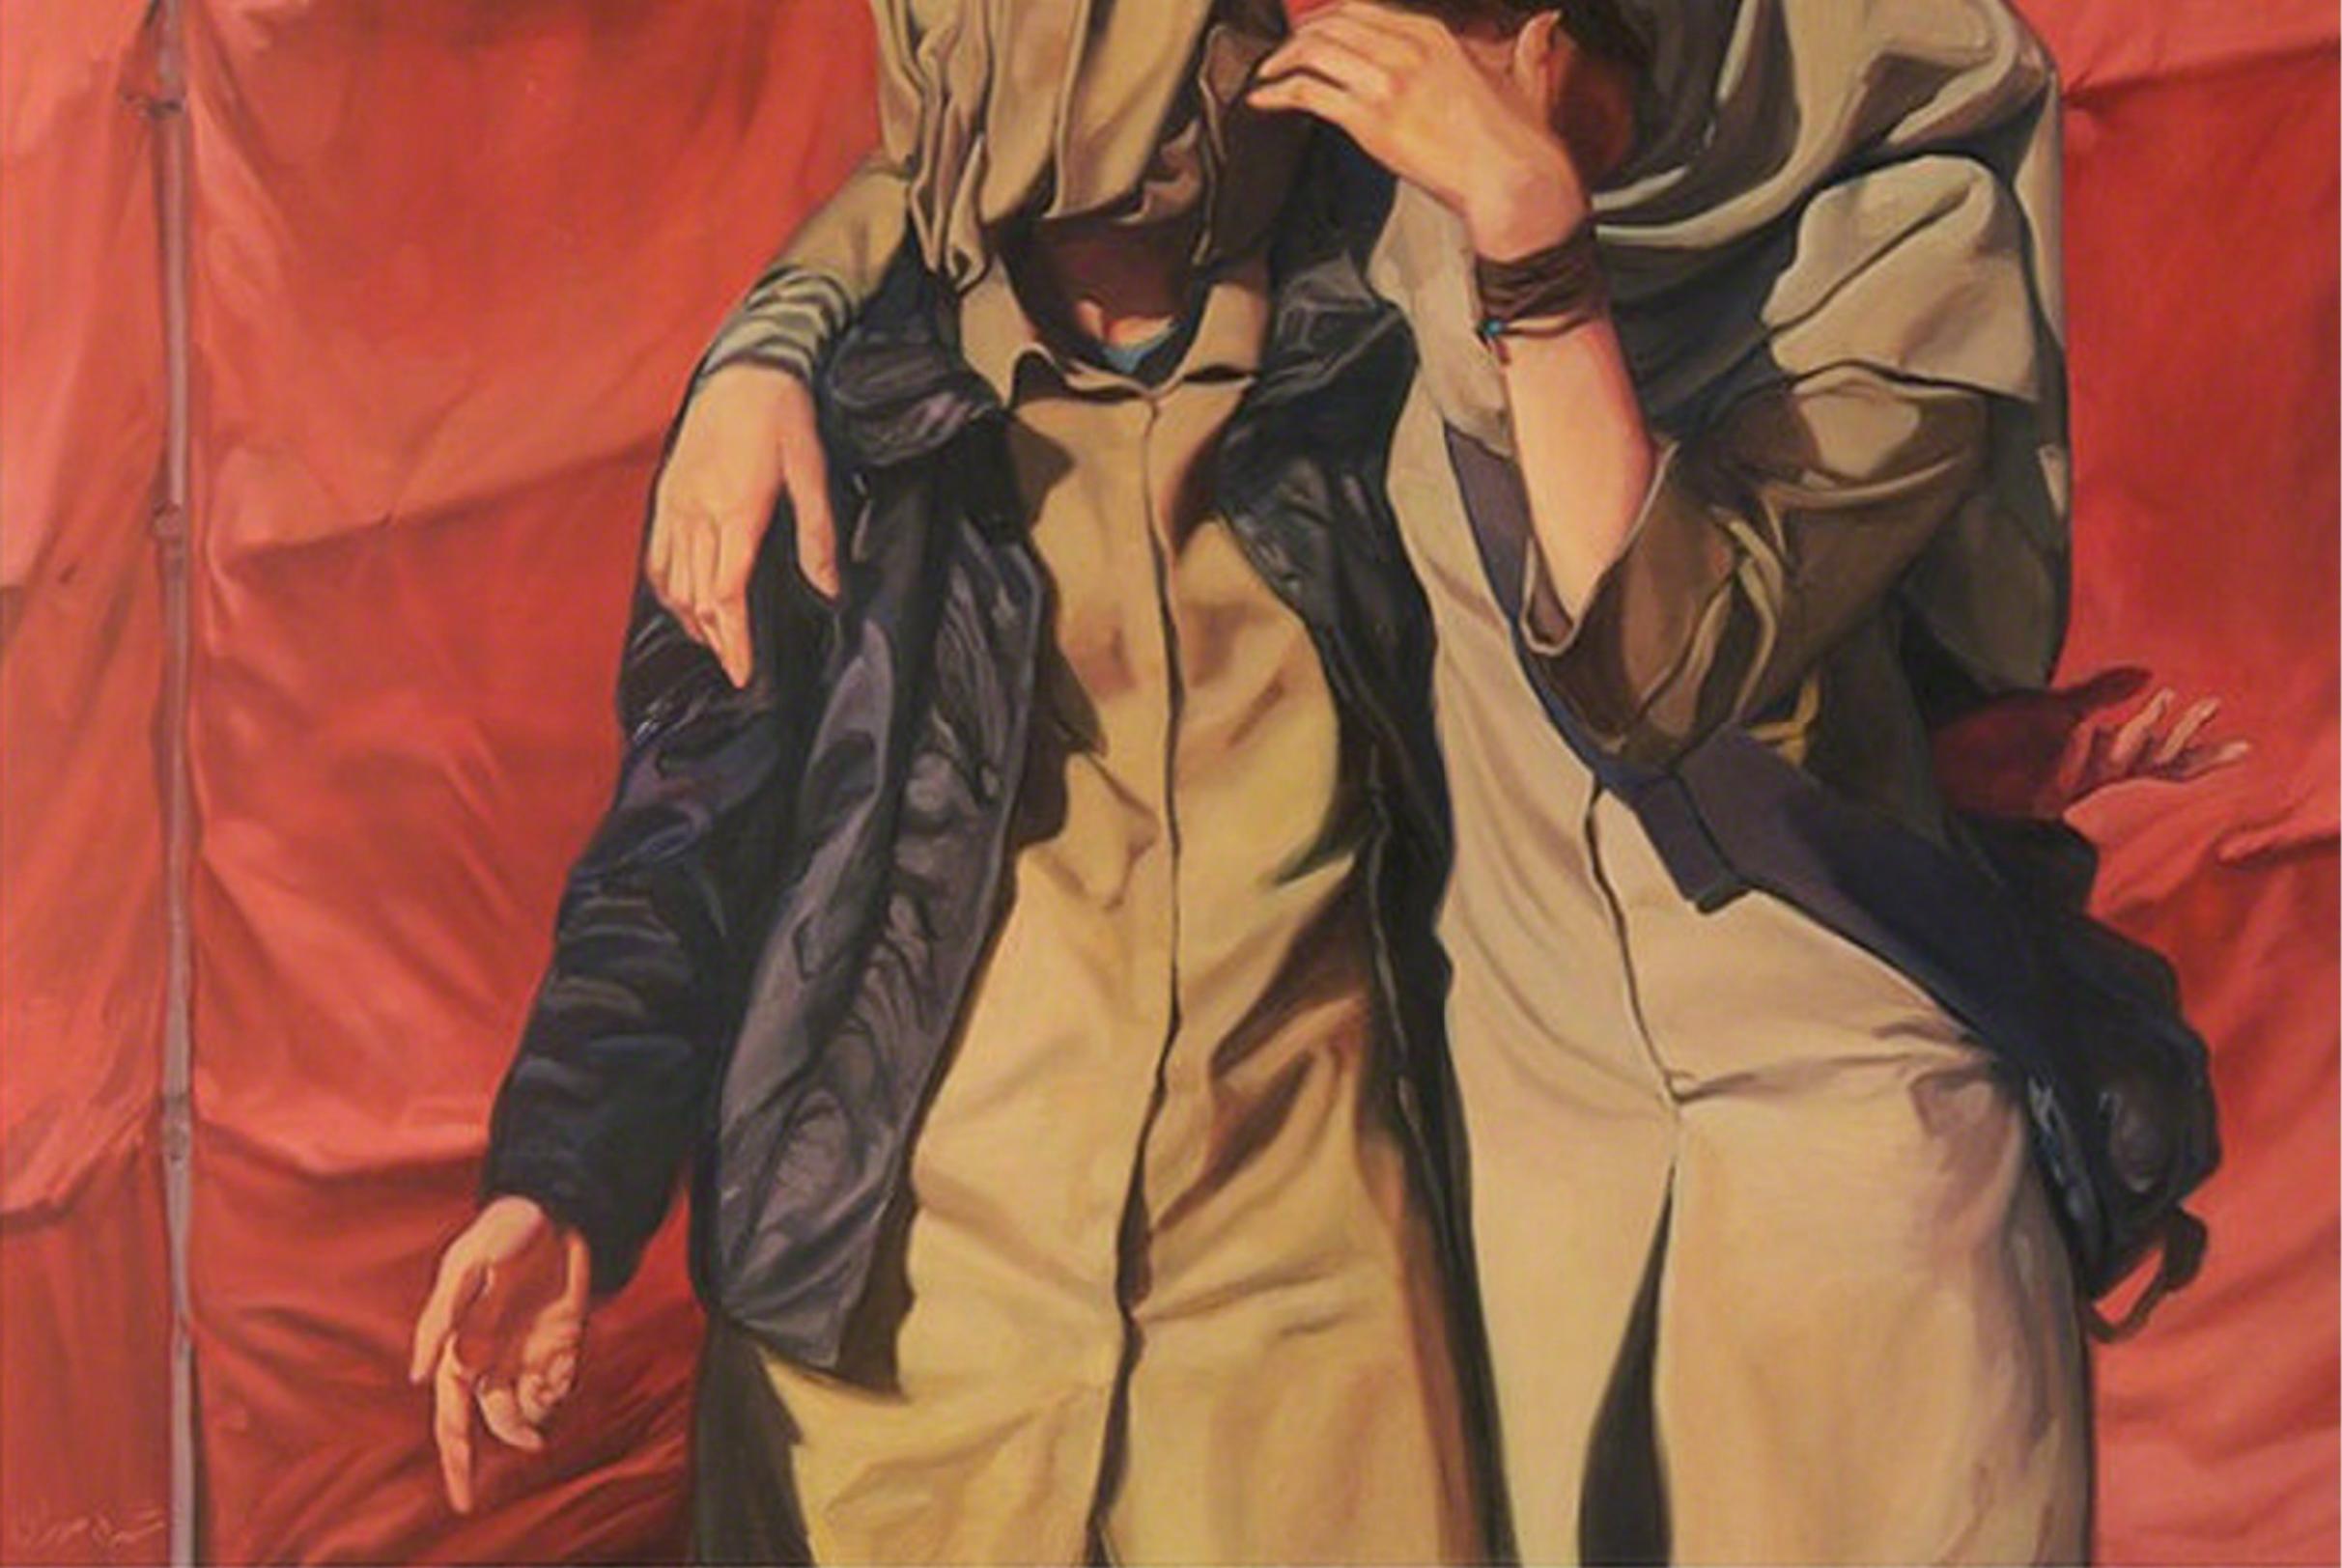 Shohreh Mehran, Untitled, oil on canvas, 100 x 150 cm, 2009